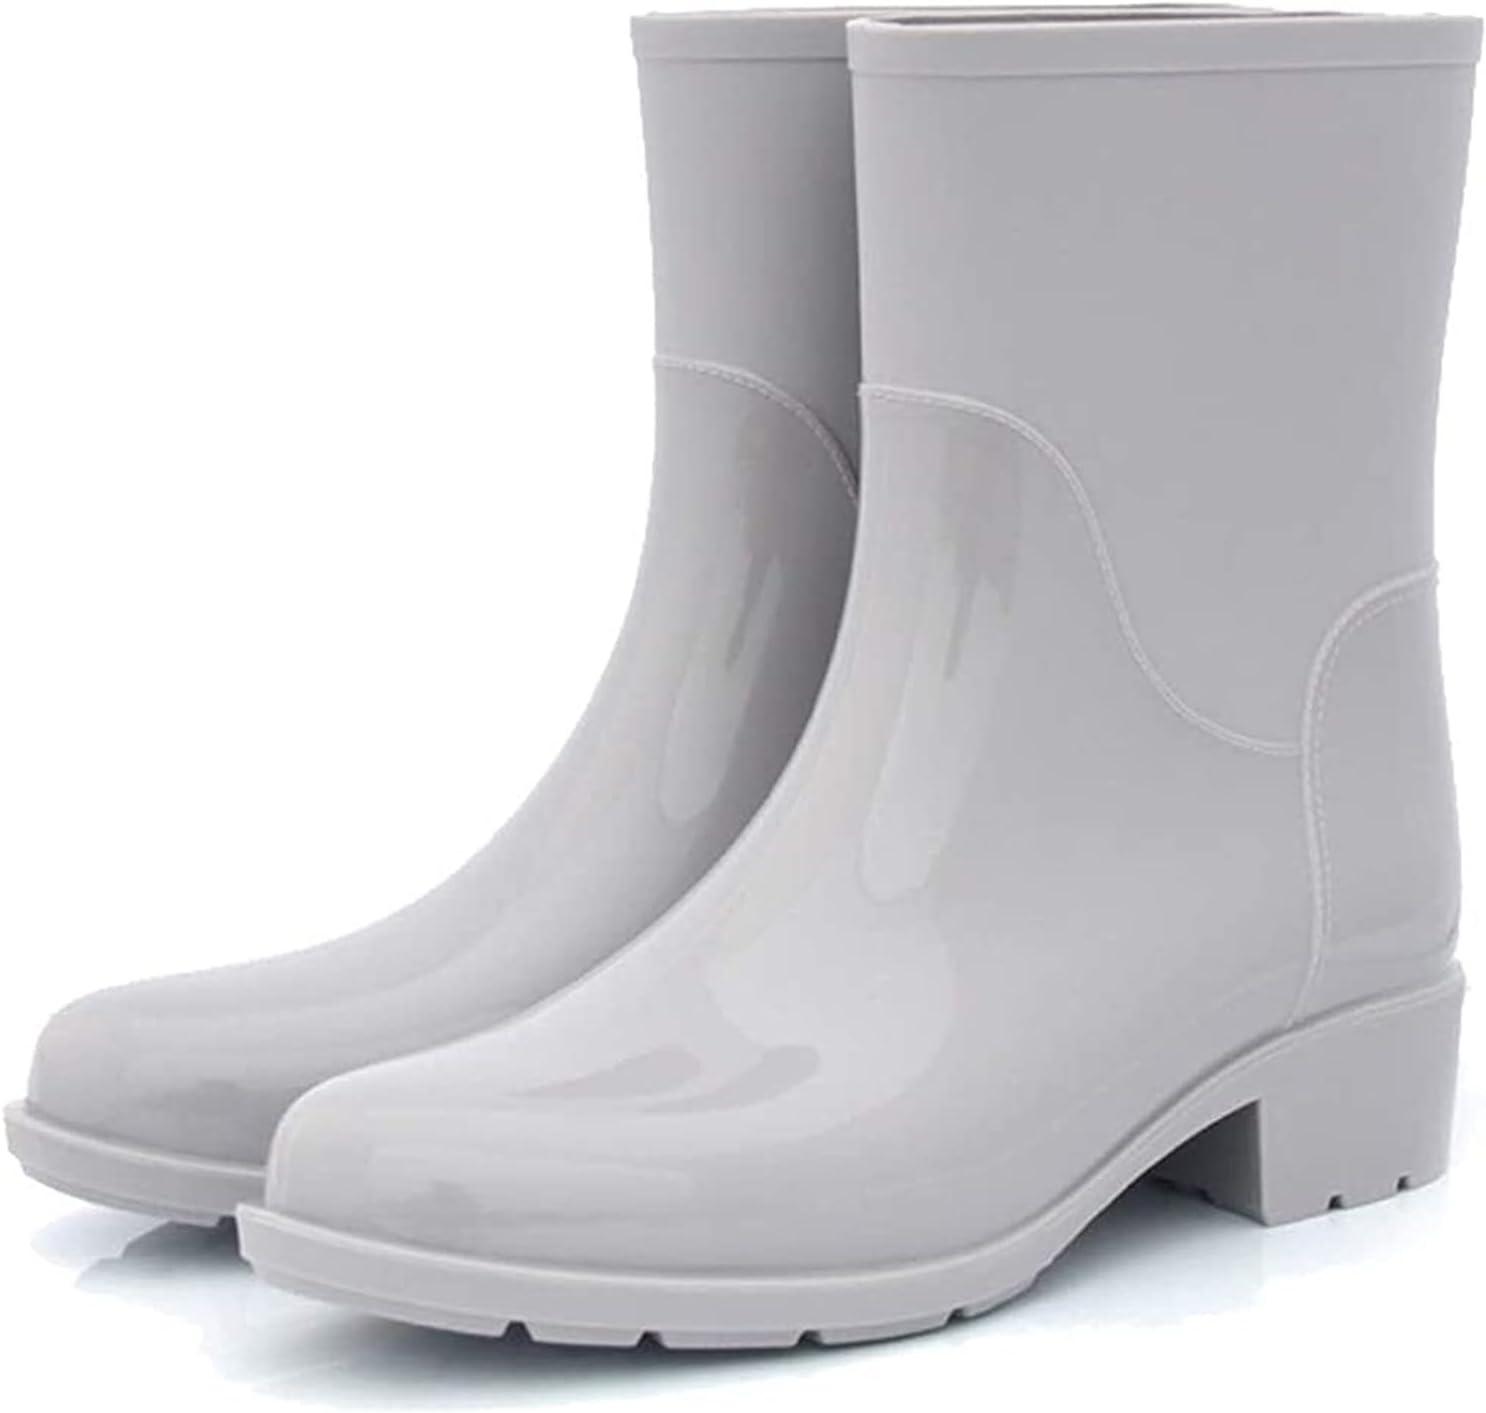 YIWANGO Stylish Lightweight Rain Boots Medium Tube Non-Slip Waterproof Boots Solid Color Ladies Garden Shoes rain Boots (Color : Gray, Size : 38 EU)